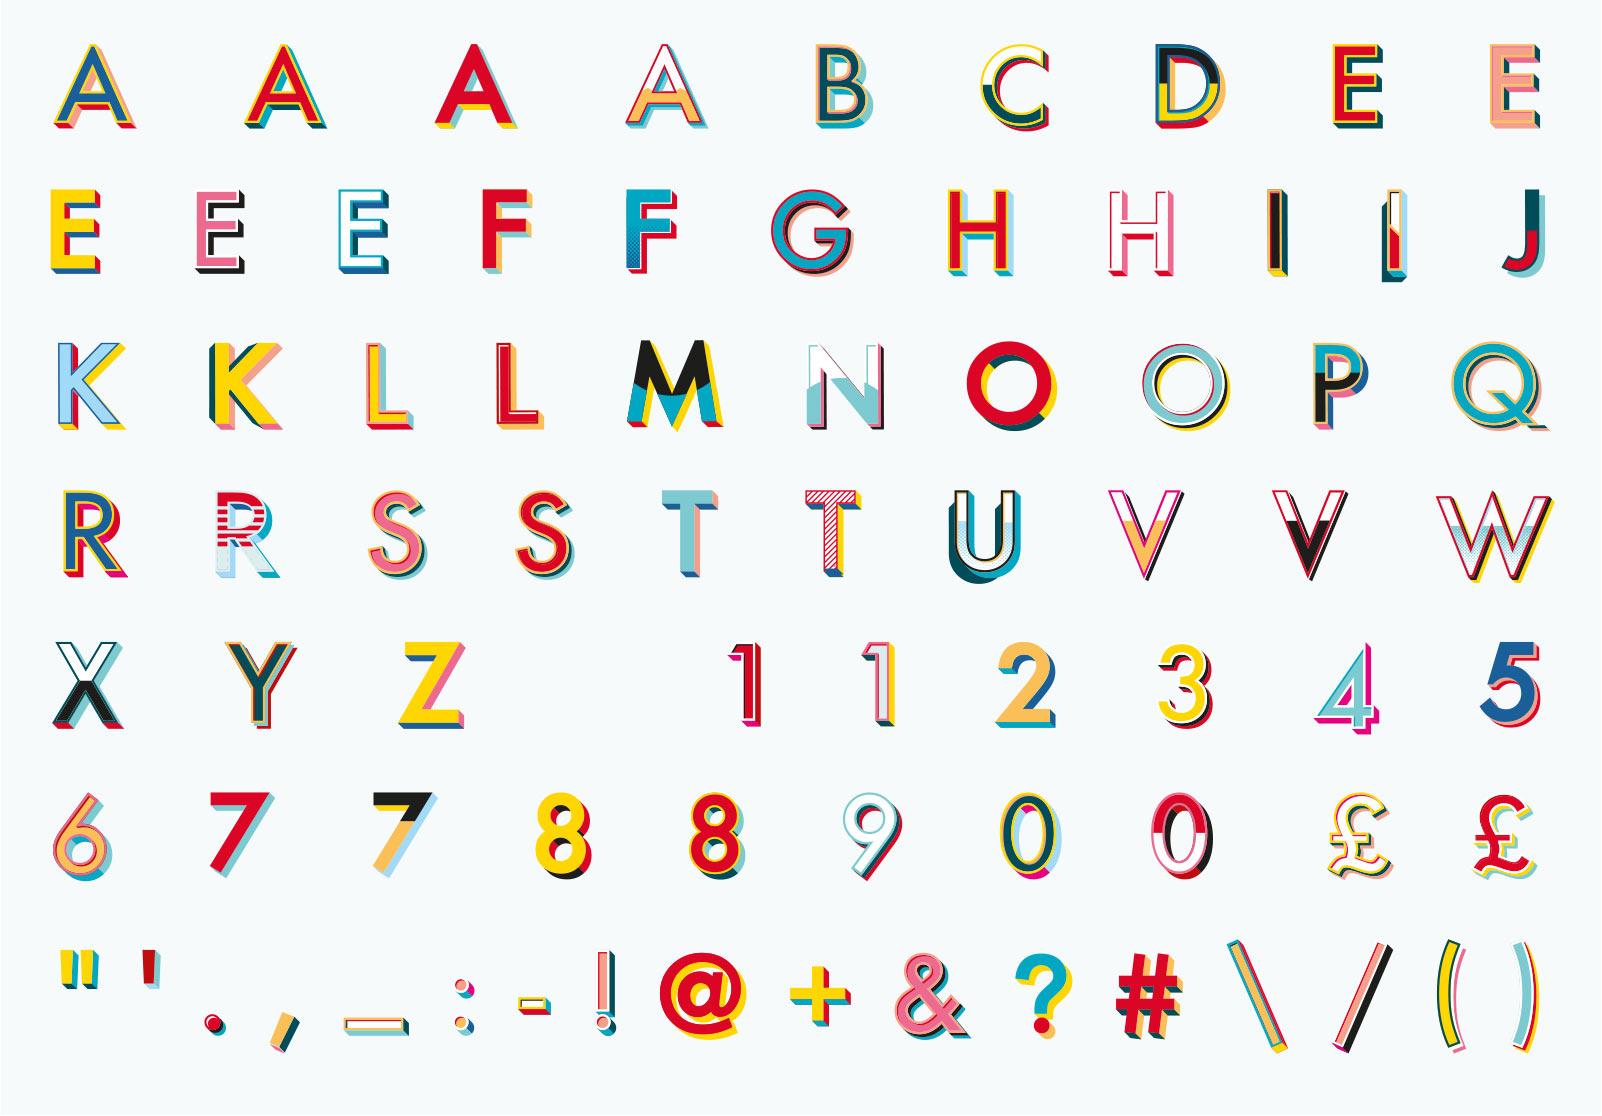 V-Festival-logo-design-branding-Form-alphabet